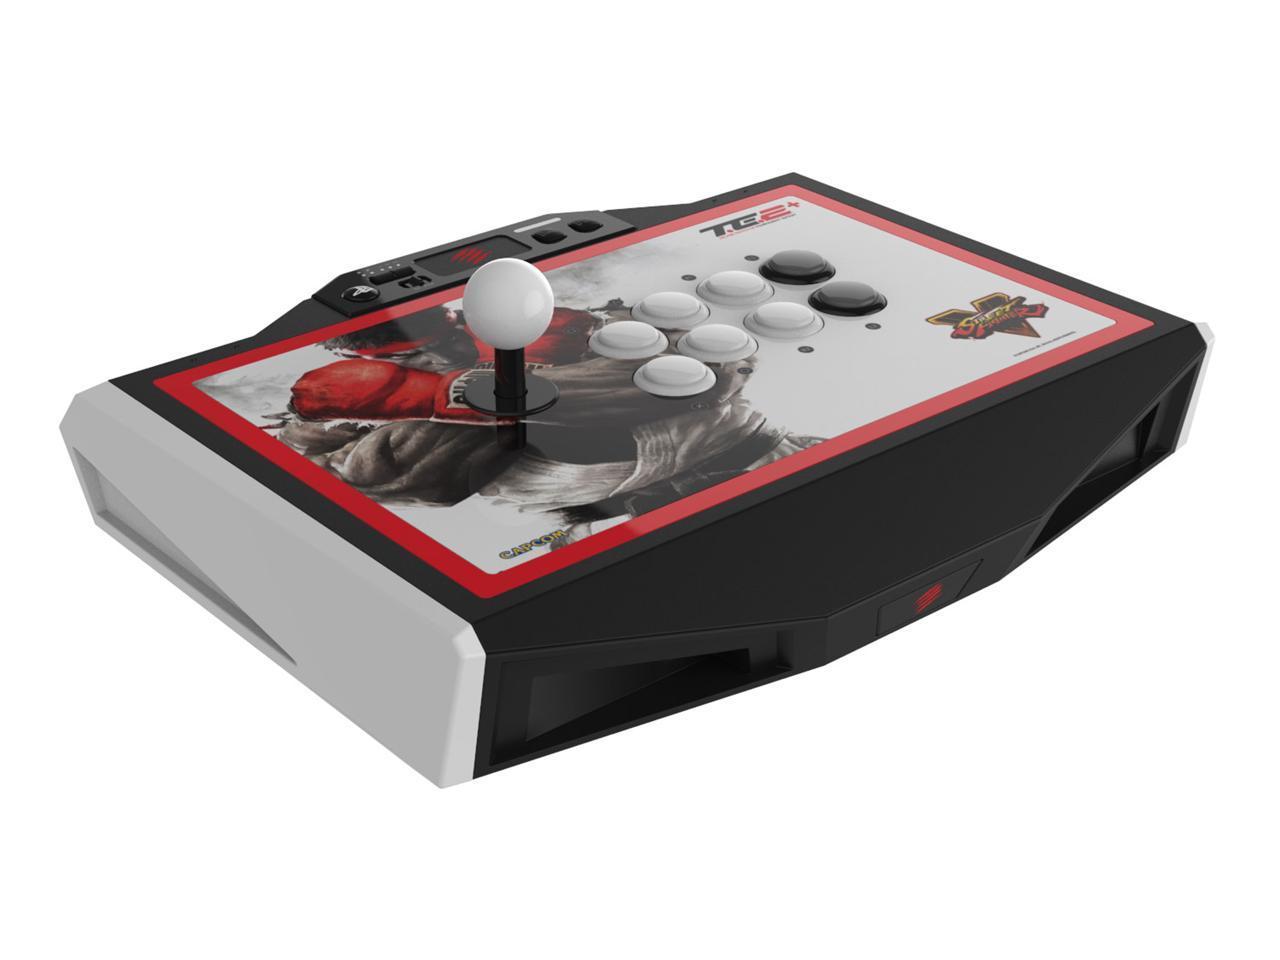 Mad Catz SFV Arcade FightStick Tournament Edition 2 For PS3 & PS4